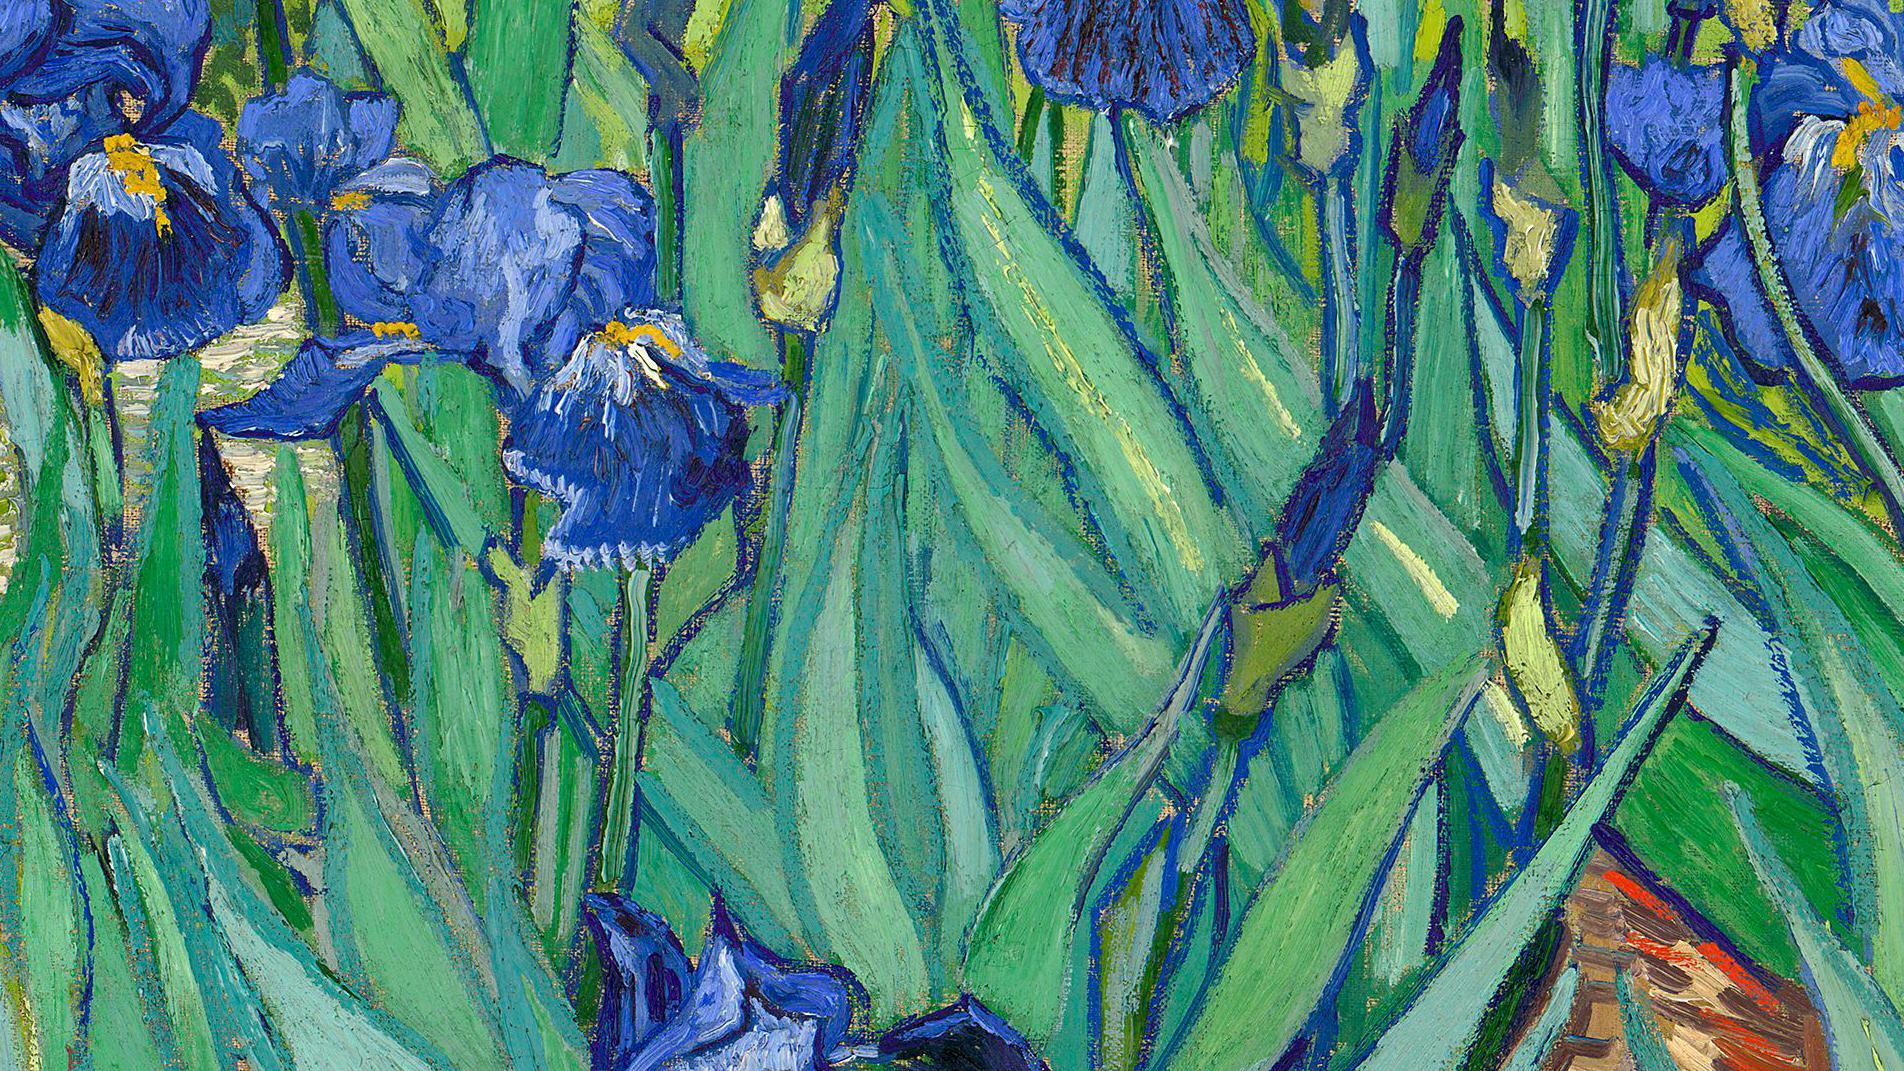 goldhurst-modern-impressionist-art-32.jpg